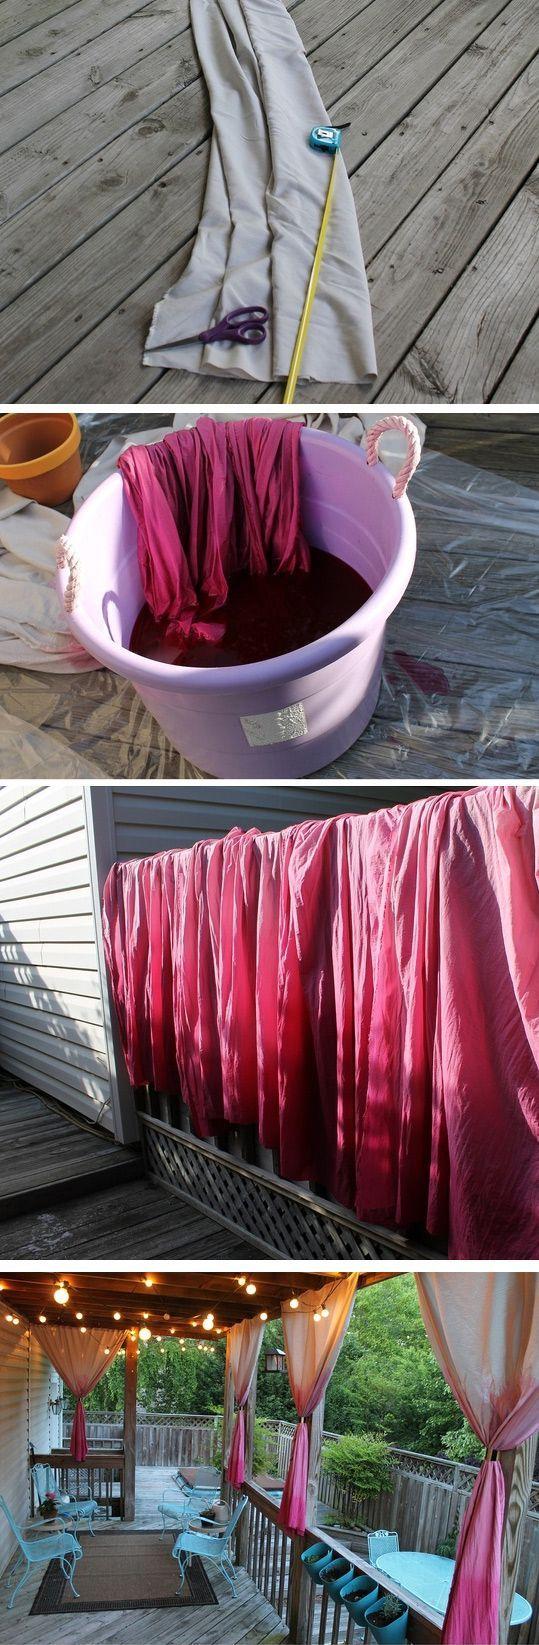 Nagyon jó a szín, a technika is :) - Curtain Dip Dye, I love this idea makes the porch look so much more elegant.